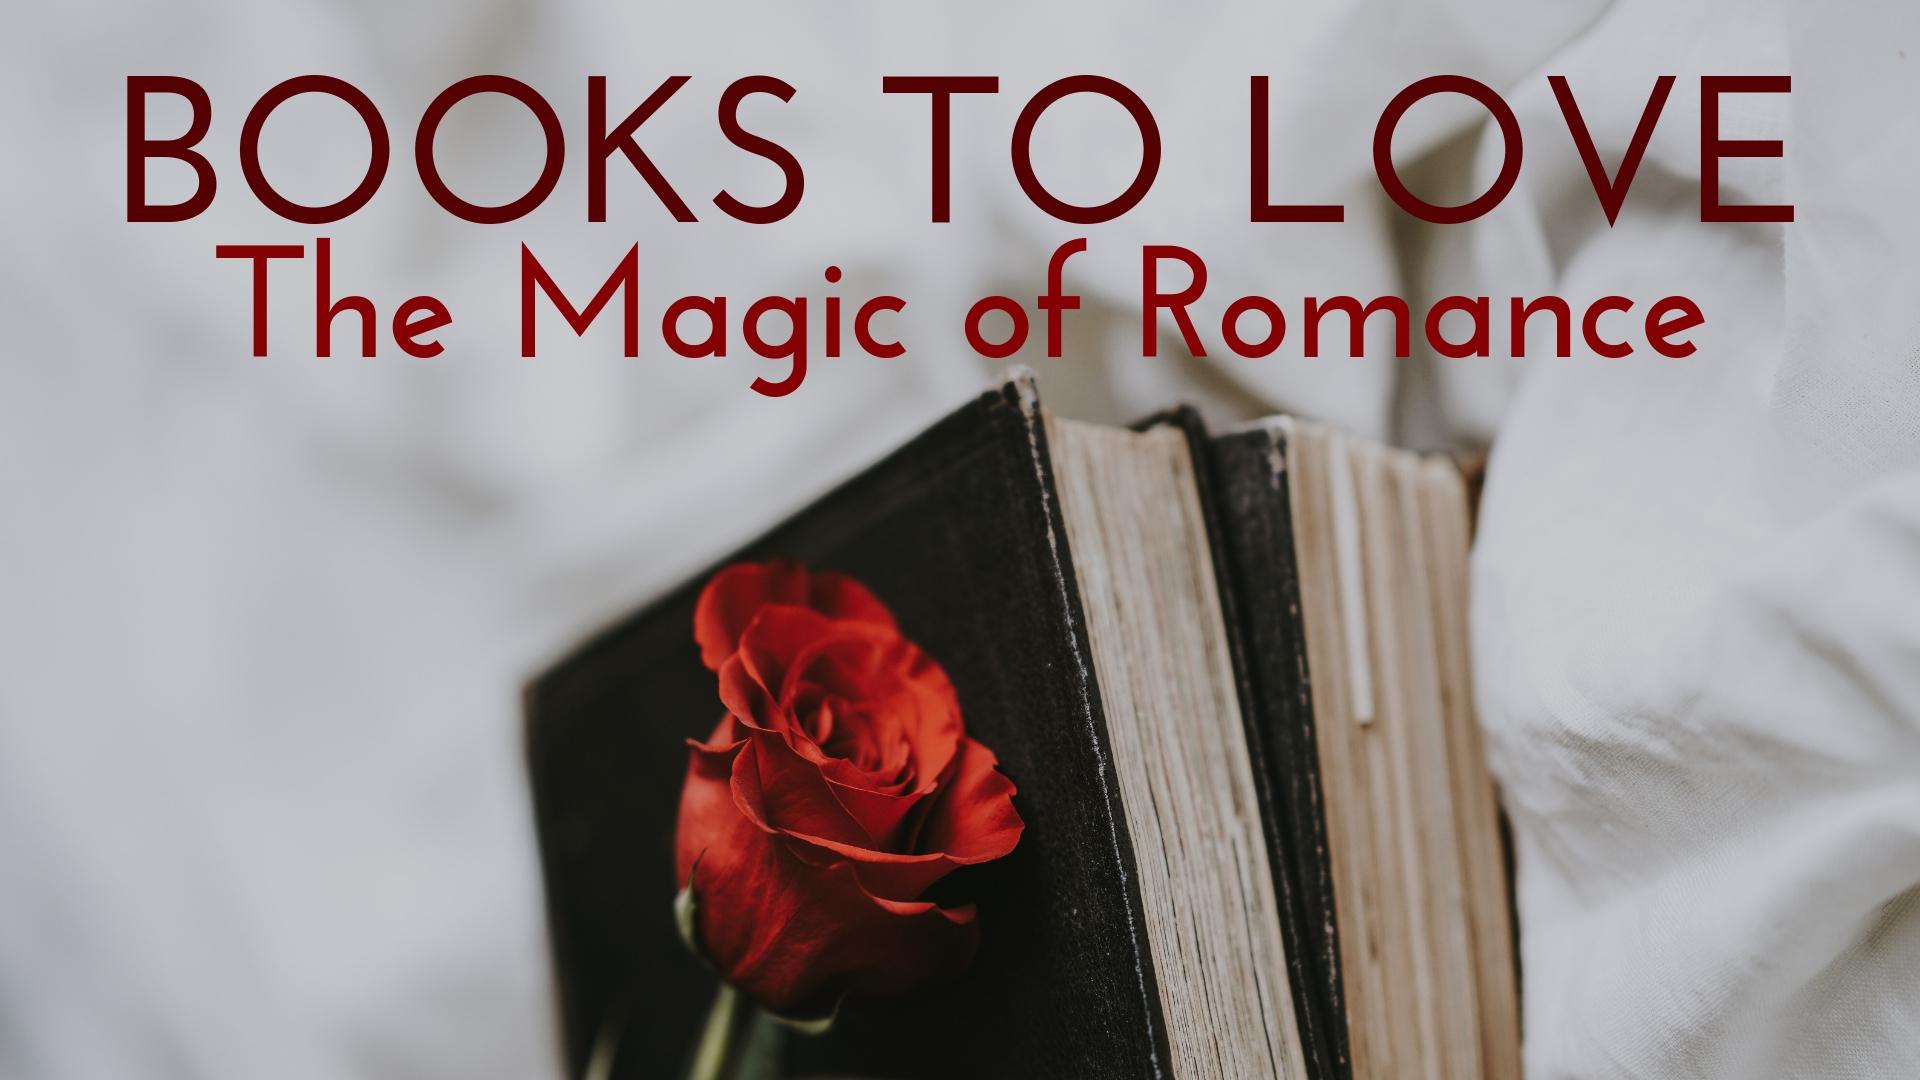 banner-books-to-love-magic-of-romance-01.jpg